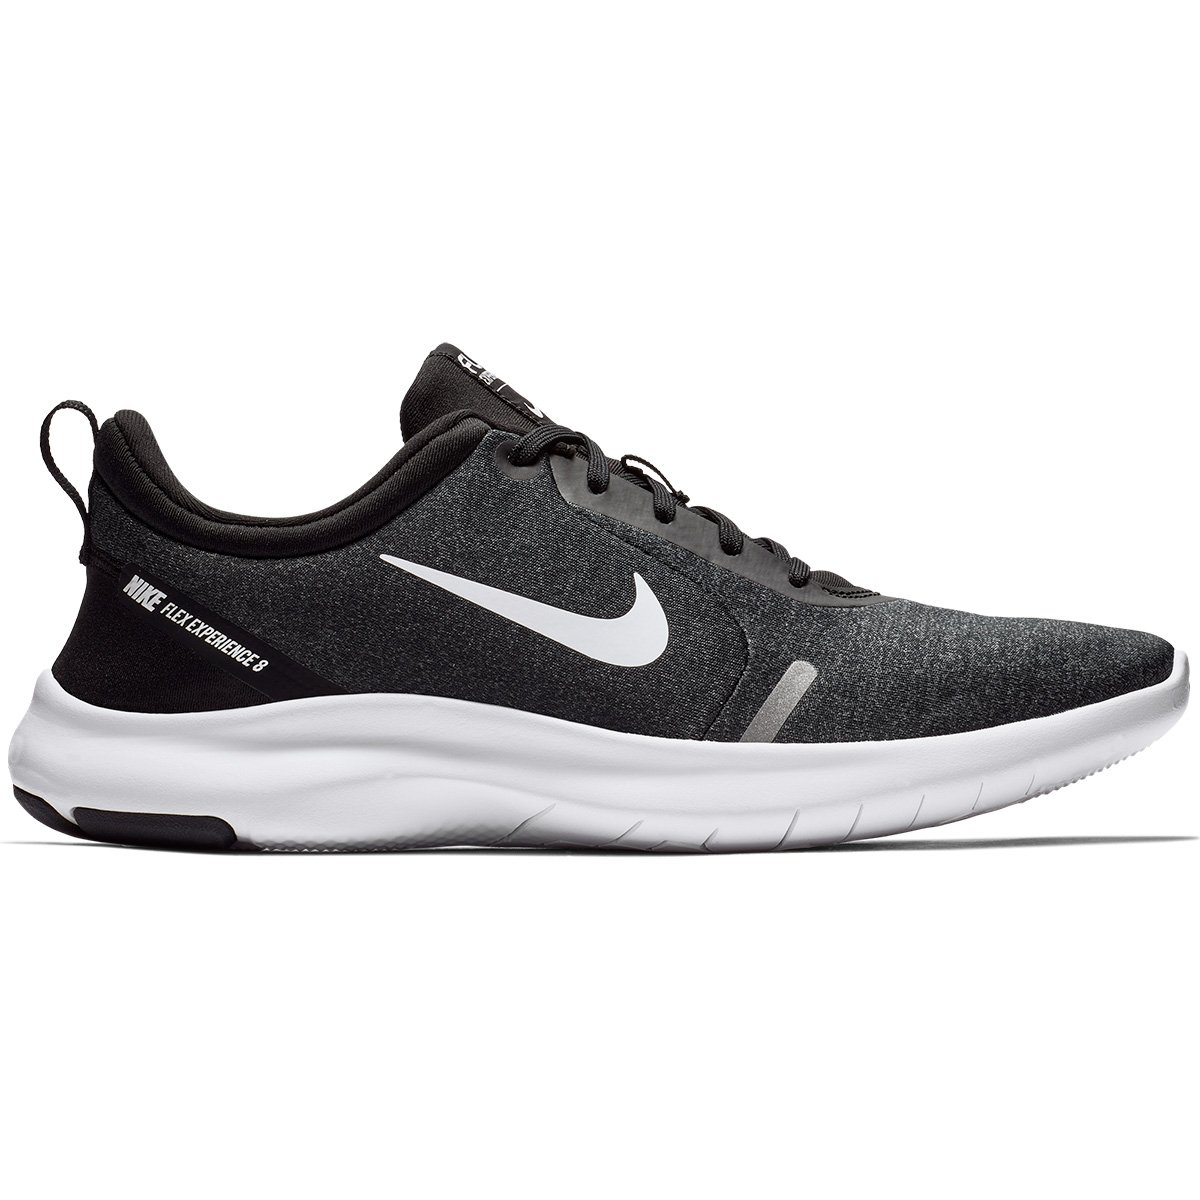 d43a6d95db1 Tênis Nike Flex Experience Rn 8 Masculino - Compre Agora